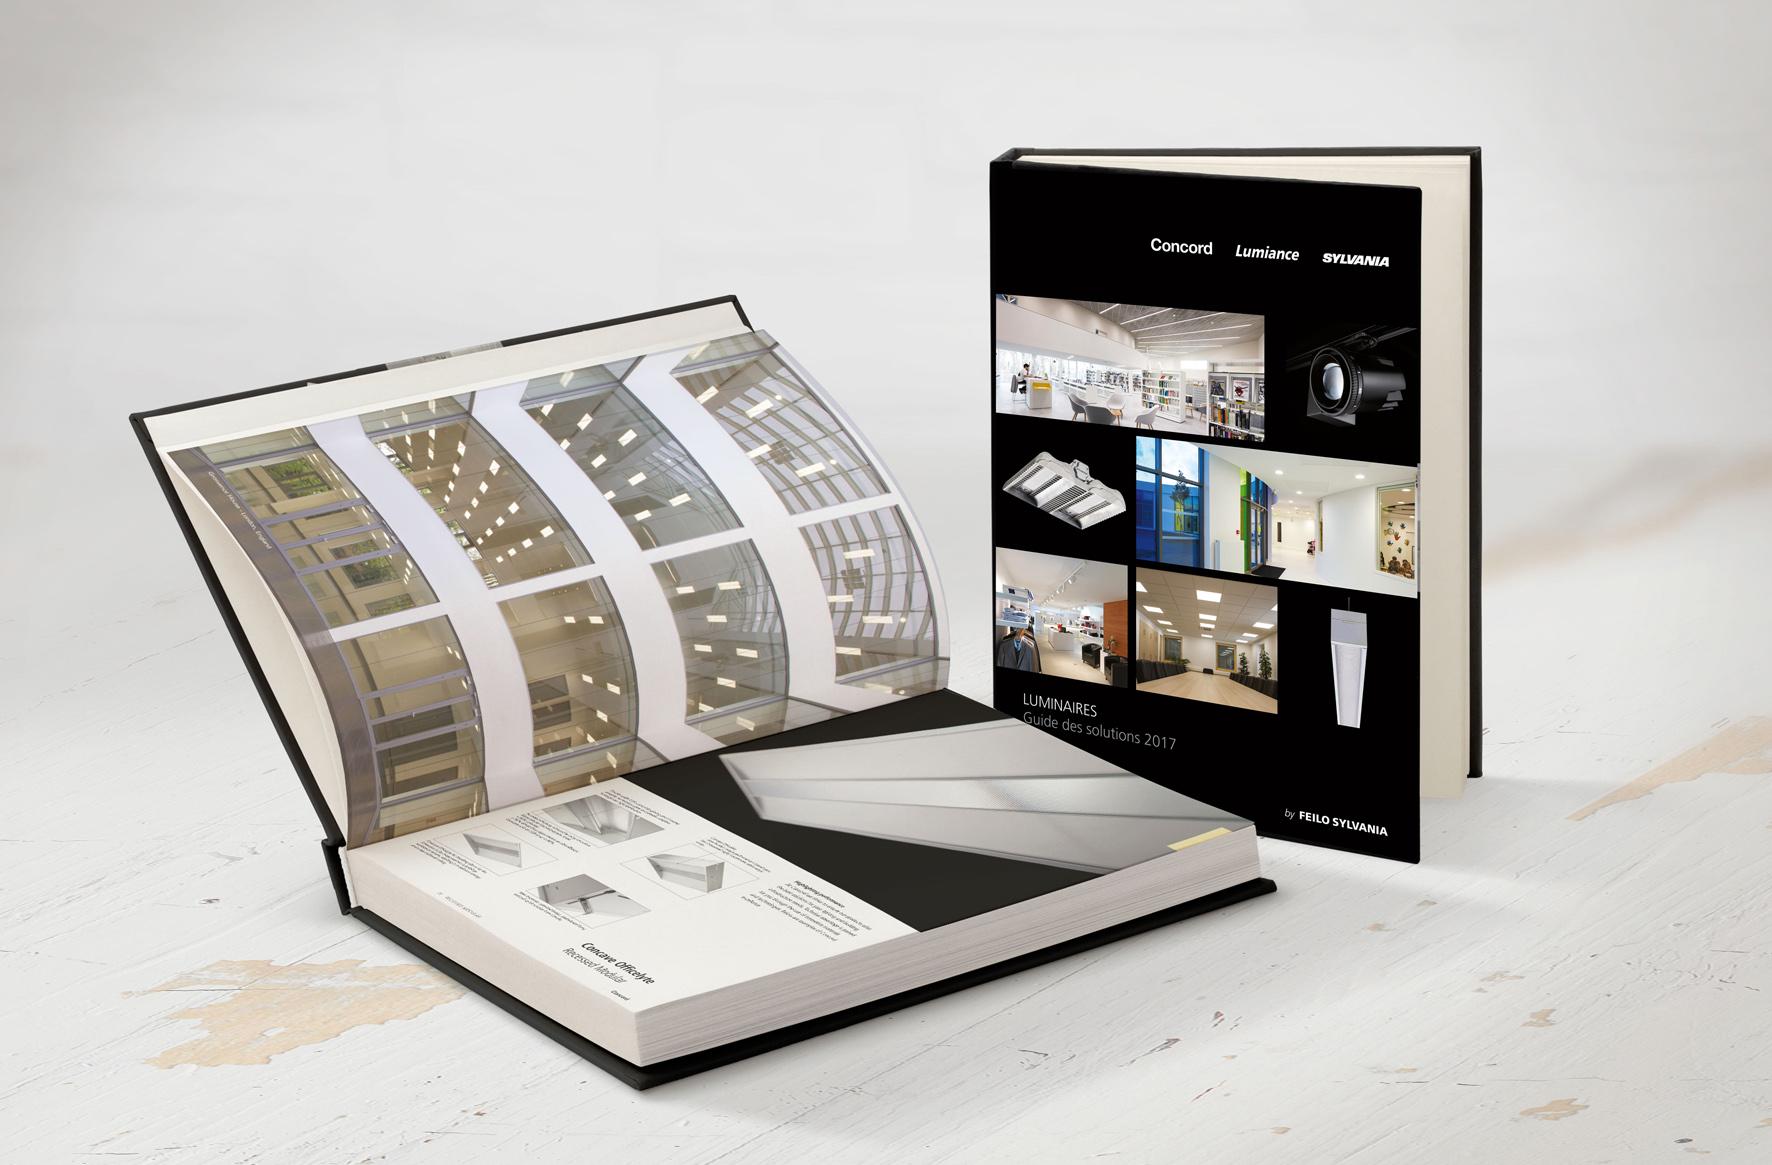 feilo sylvania guide 2017 luminaires feilo sylvania guide 2017 10 15 andr sudrie. Black Bedroom Furniture Sets. Home Design Ideas